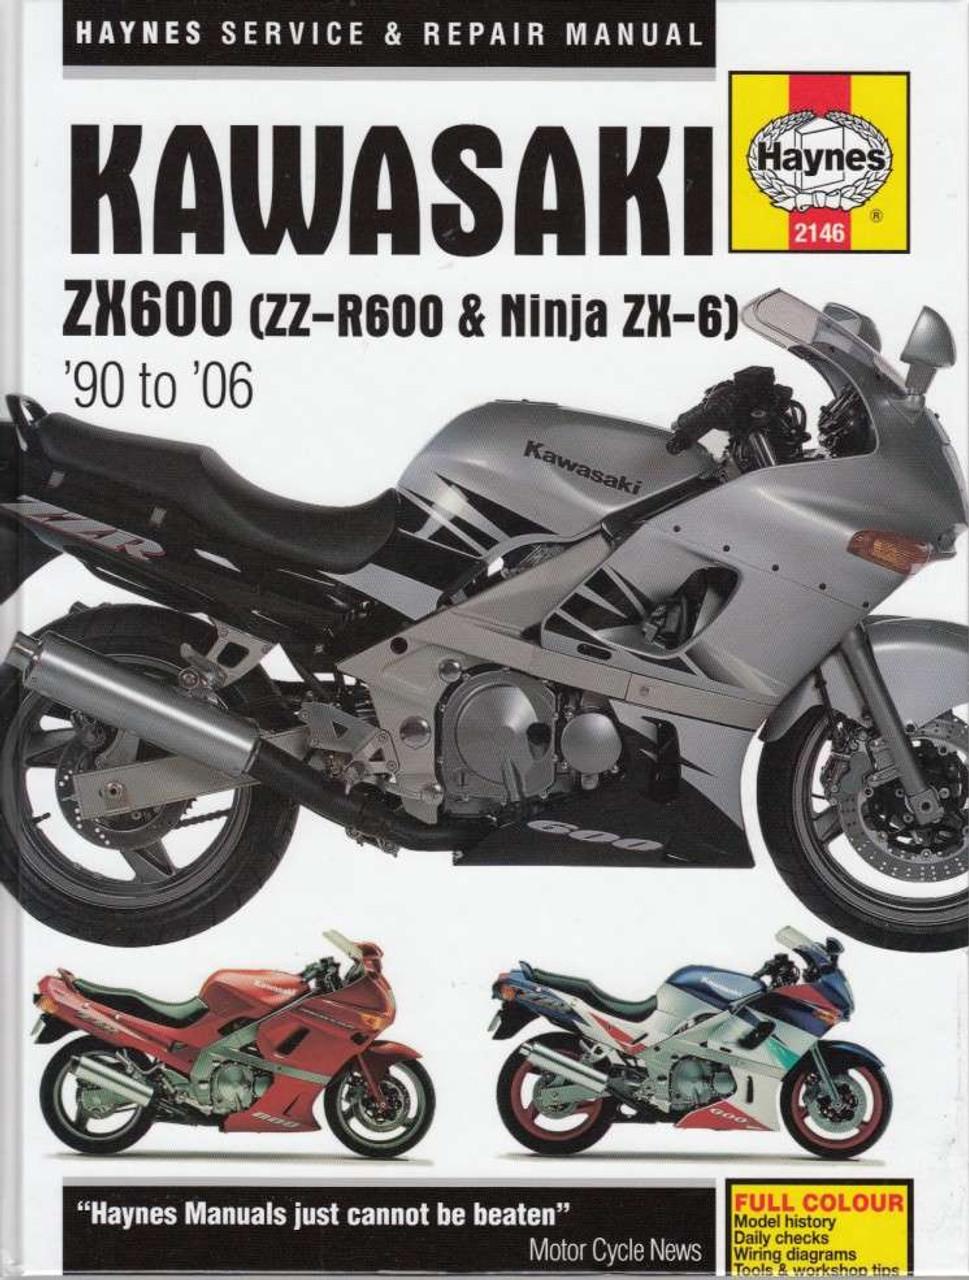 kawasaki zx600 zz r600 ninja zx 6 1990 2006 workshop manual rh automotobookshop com au zx600 wiring diagram